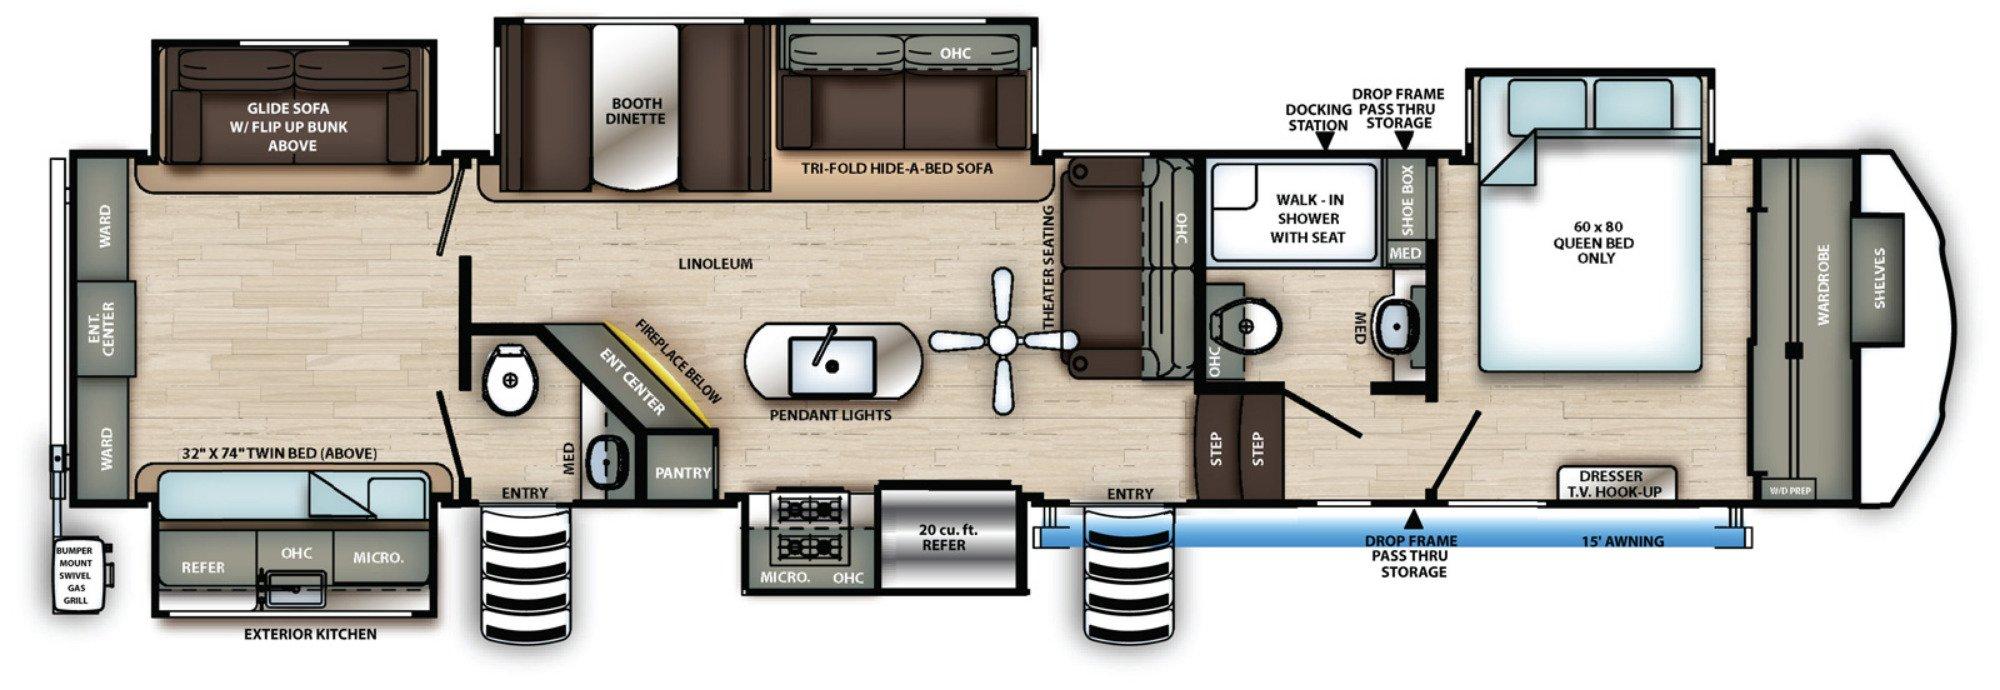 View Floor Plan for 2021 FOREST RIVER SIERRA 384QBOK